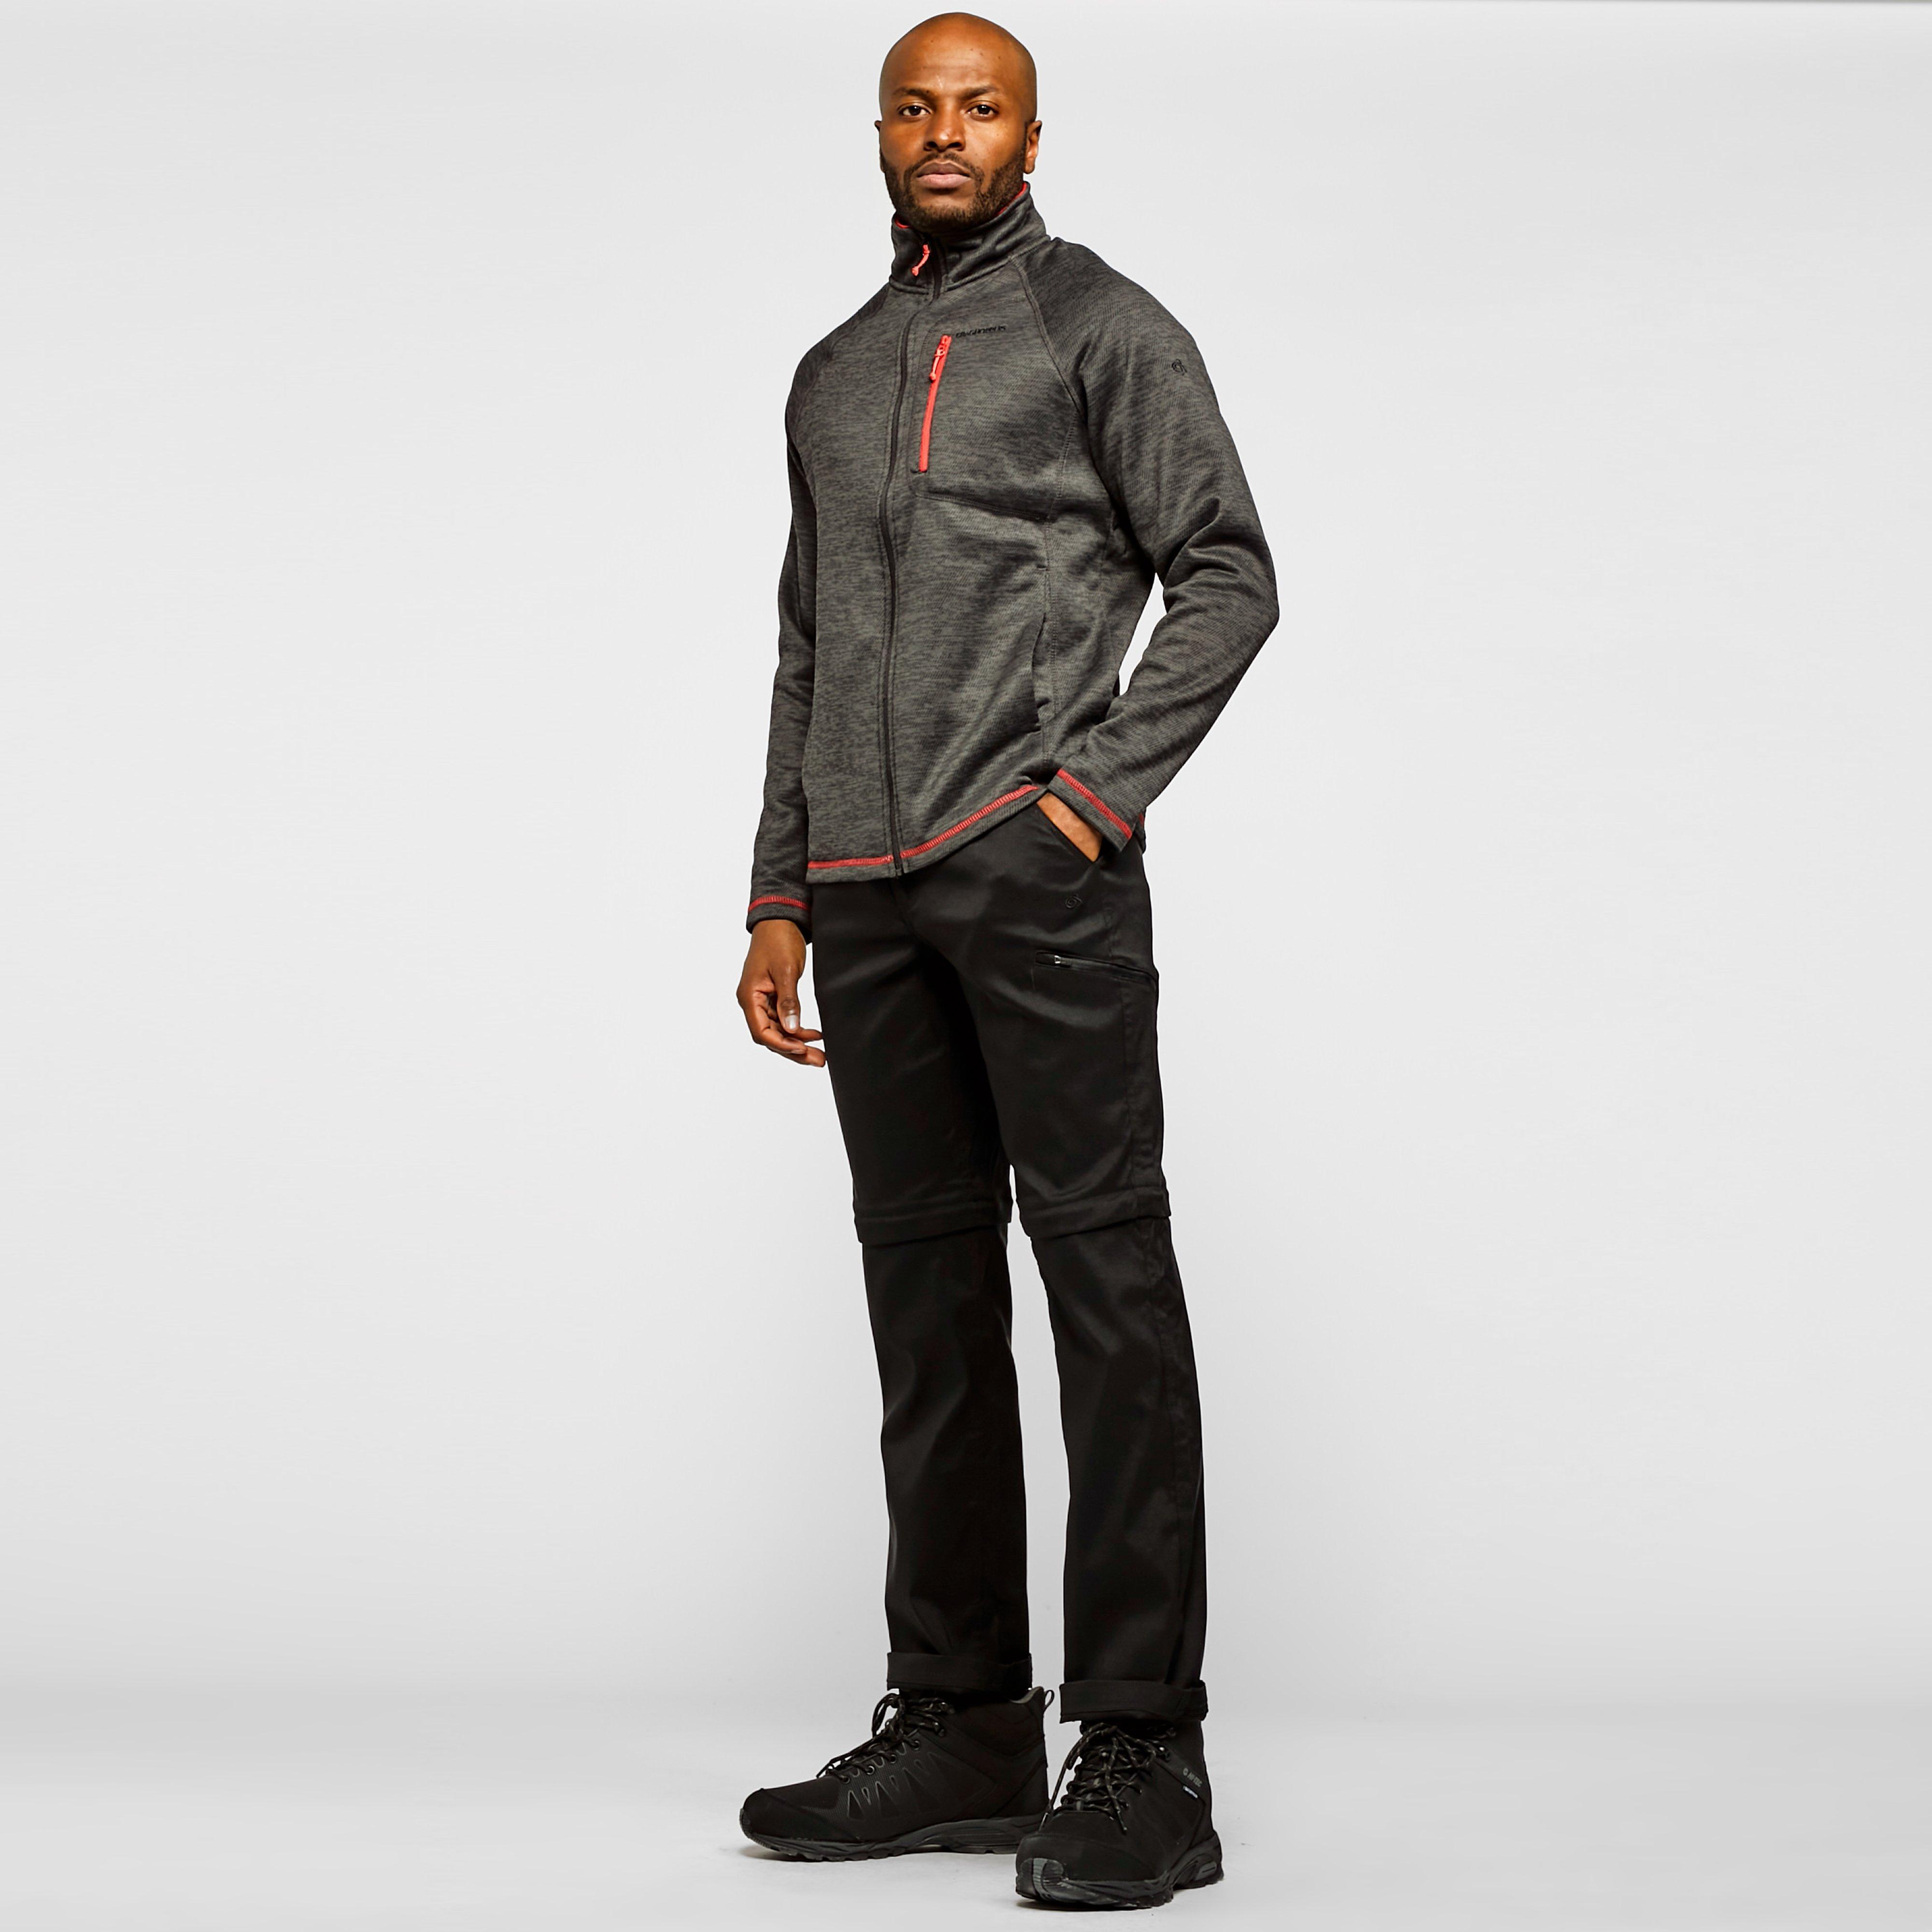 Craghoppers Men's Kiwi Pro Convertible Trousers - Black/Blk, Black